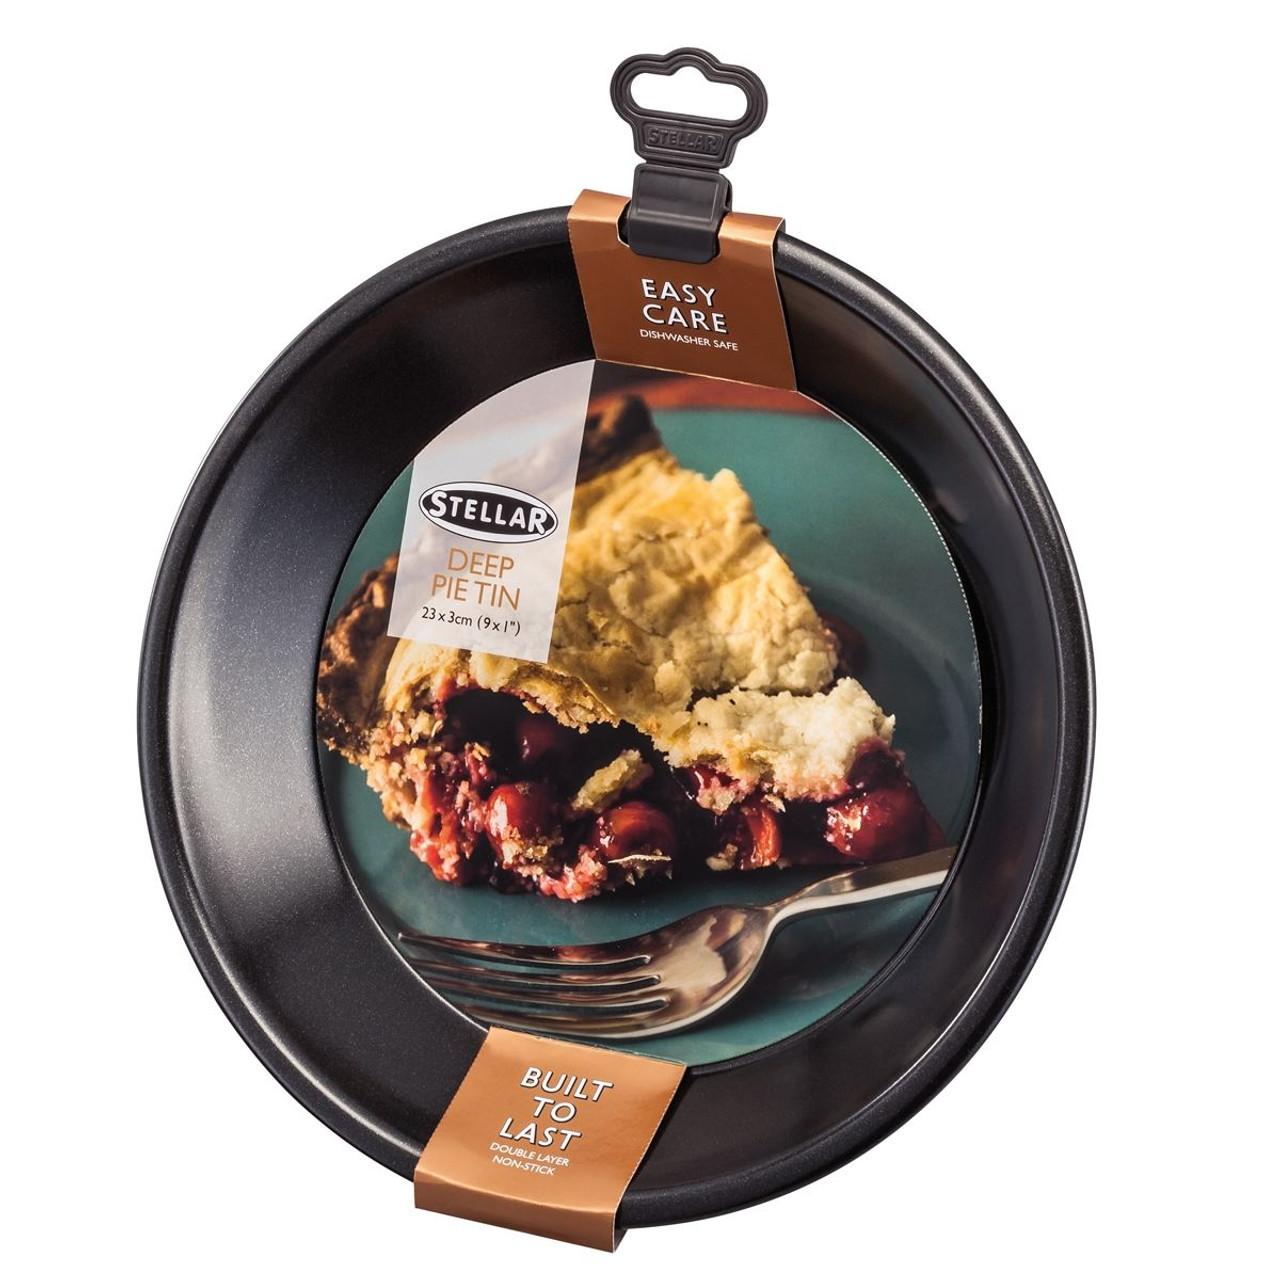 Stellar Deep Pie Tin